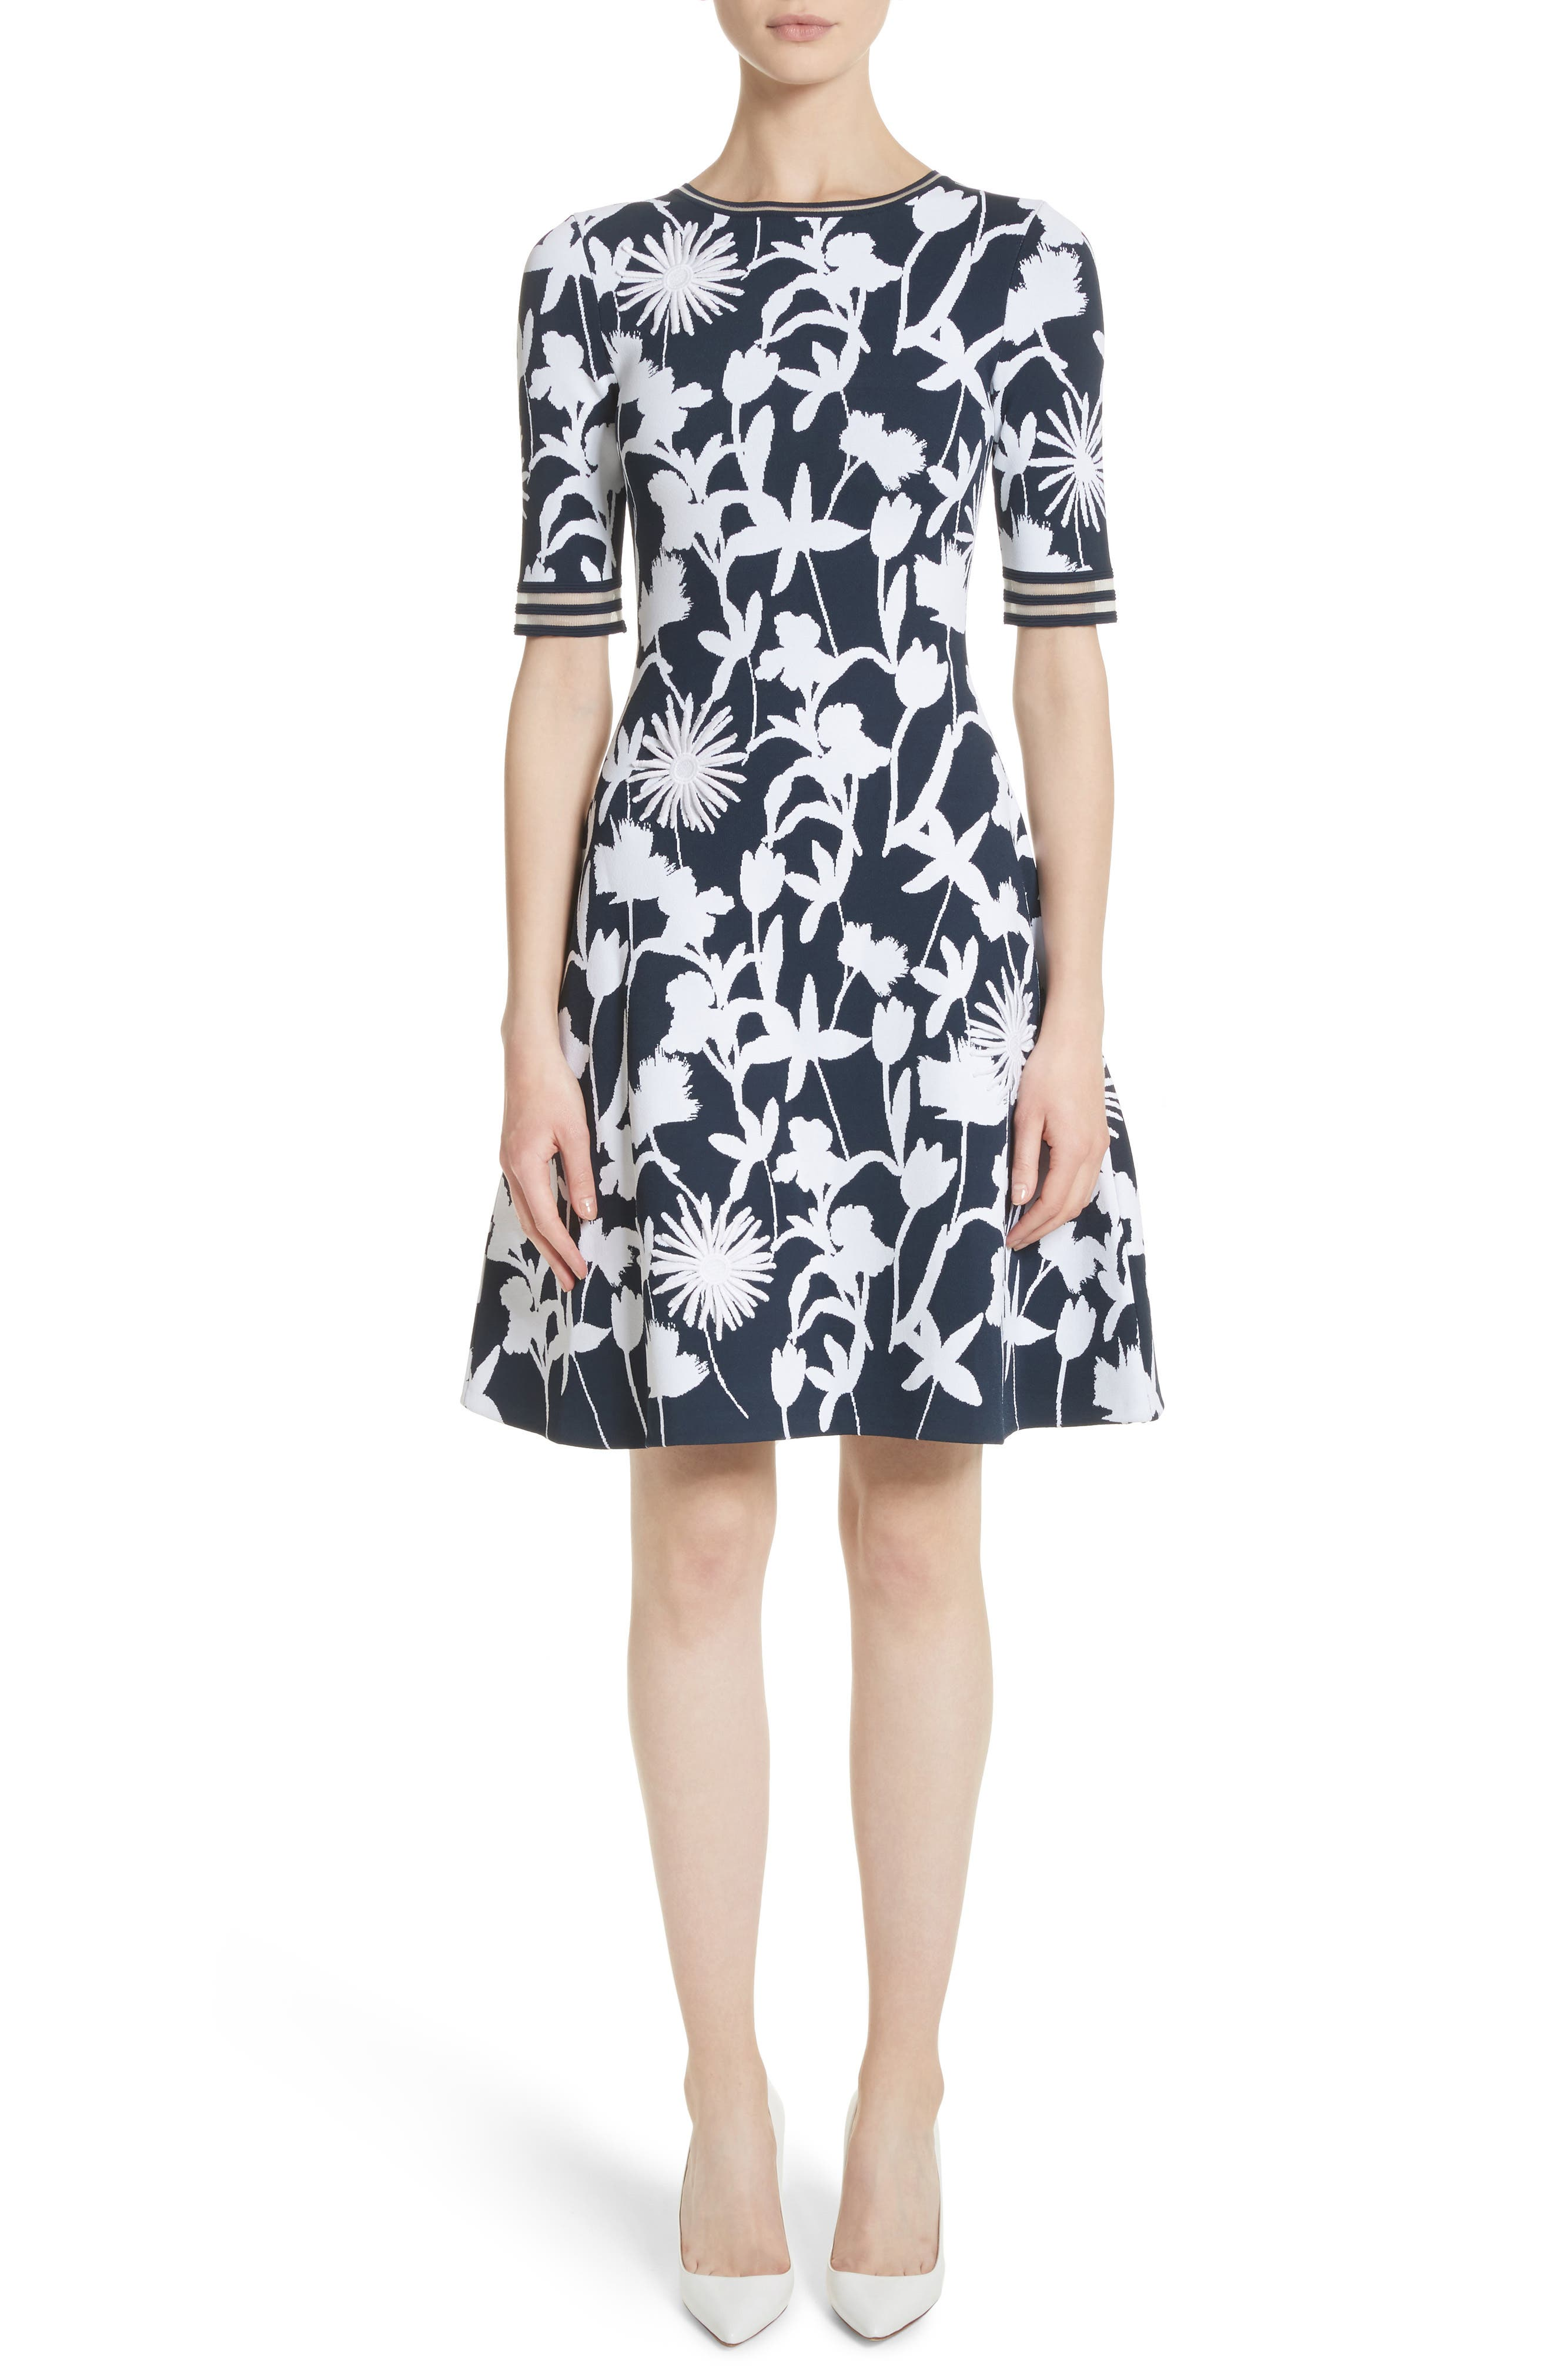 Floral Appliqué Intarsia Knit Dress,                         Main,                         color, Navy/ White